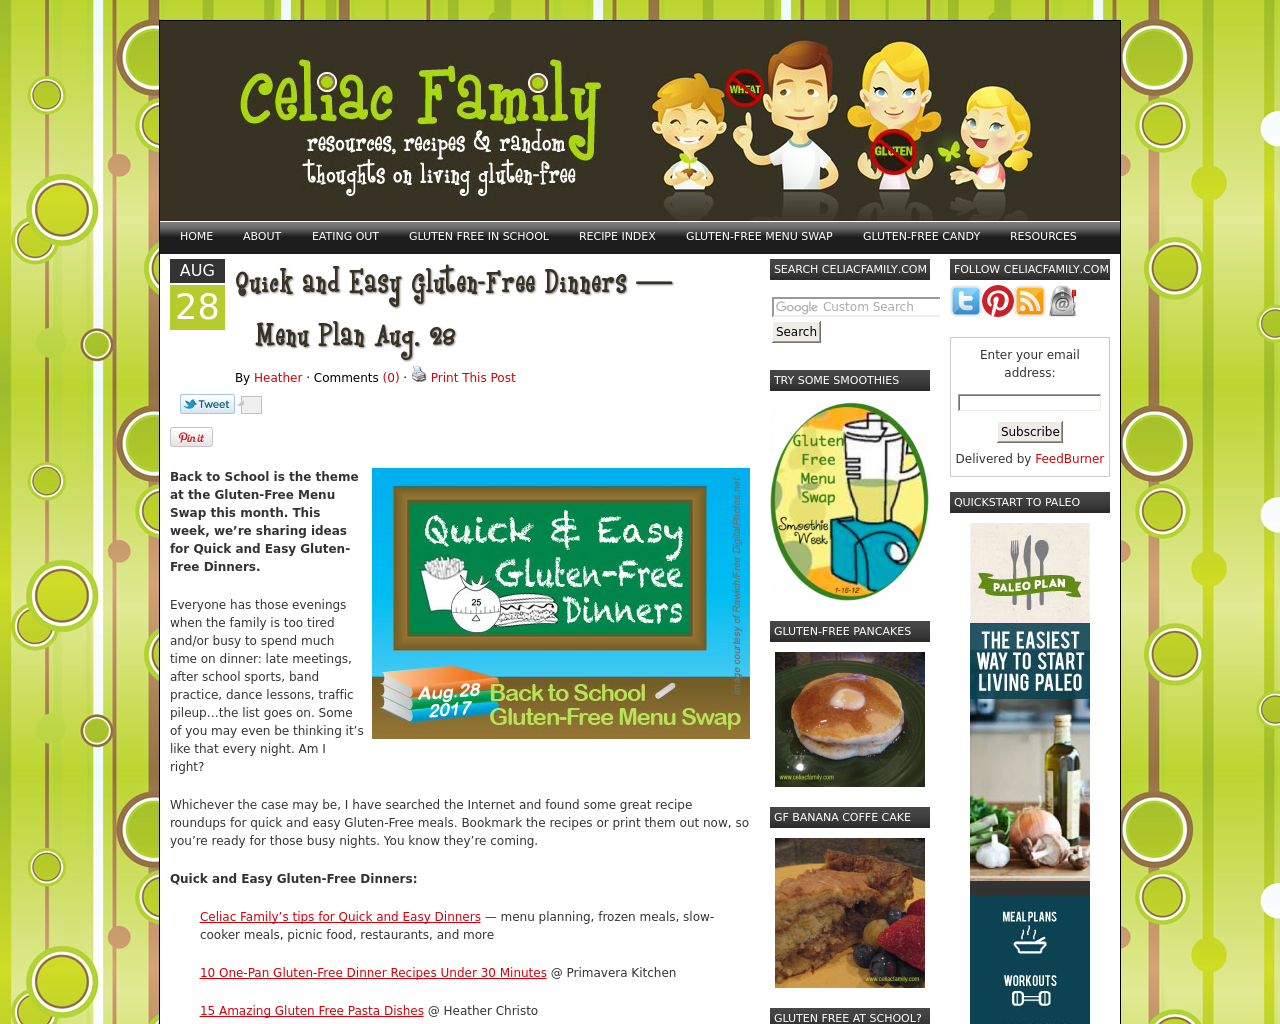 Celiac-Family-Advertising-Reviews-Pricing